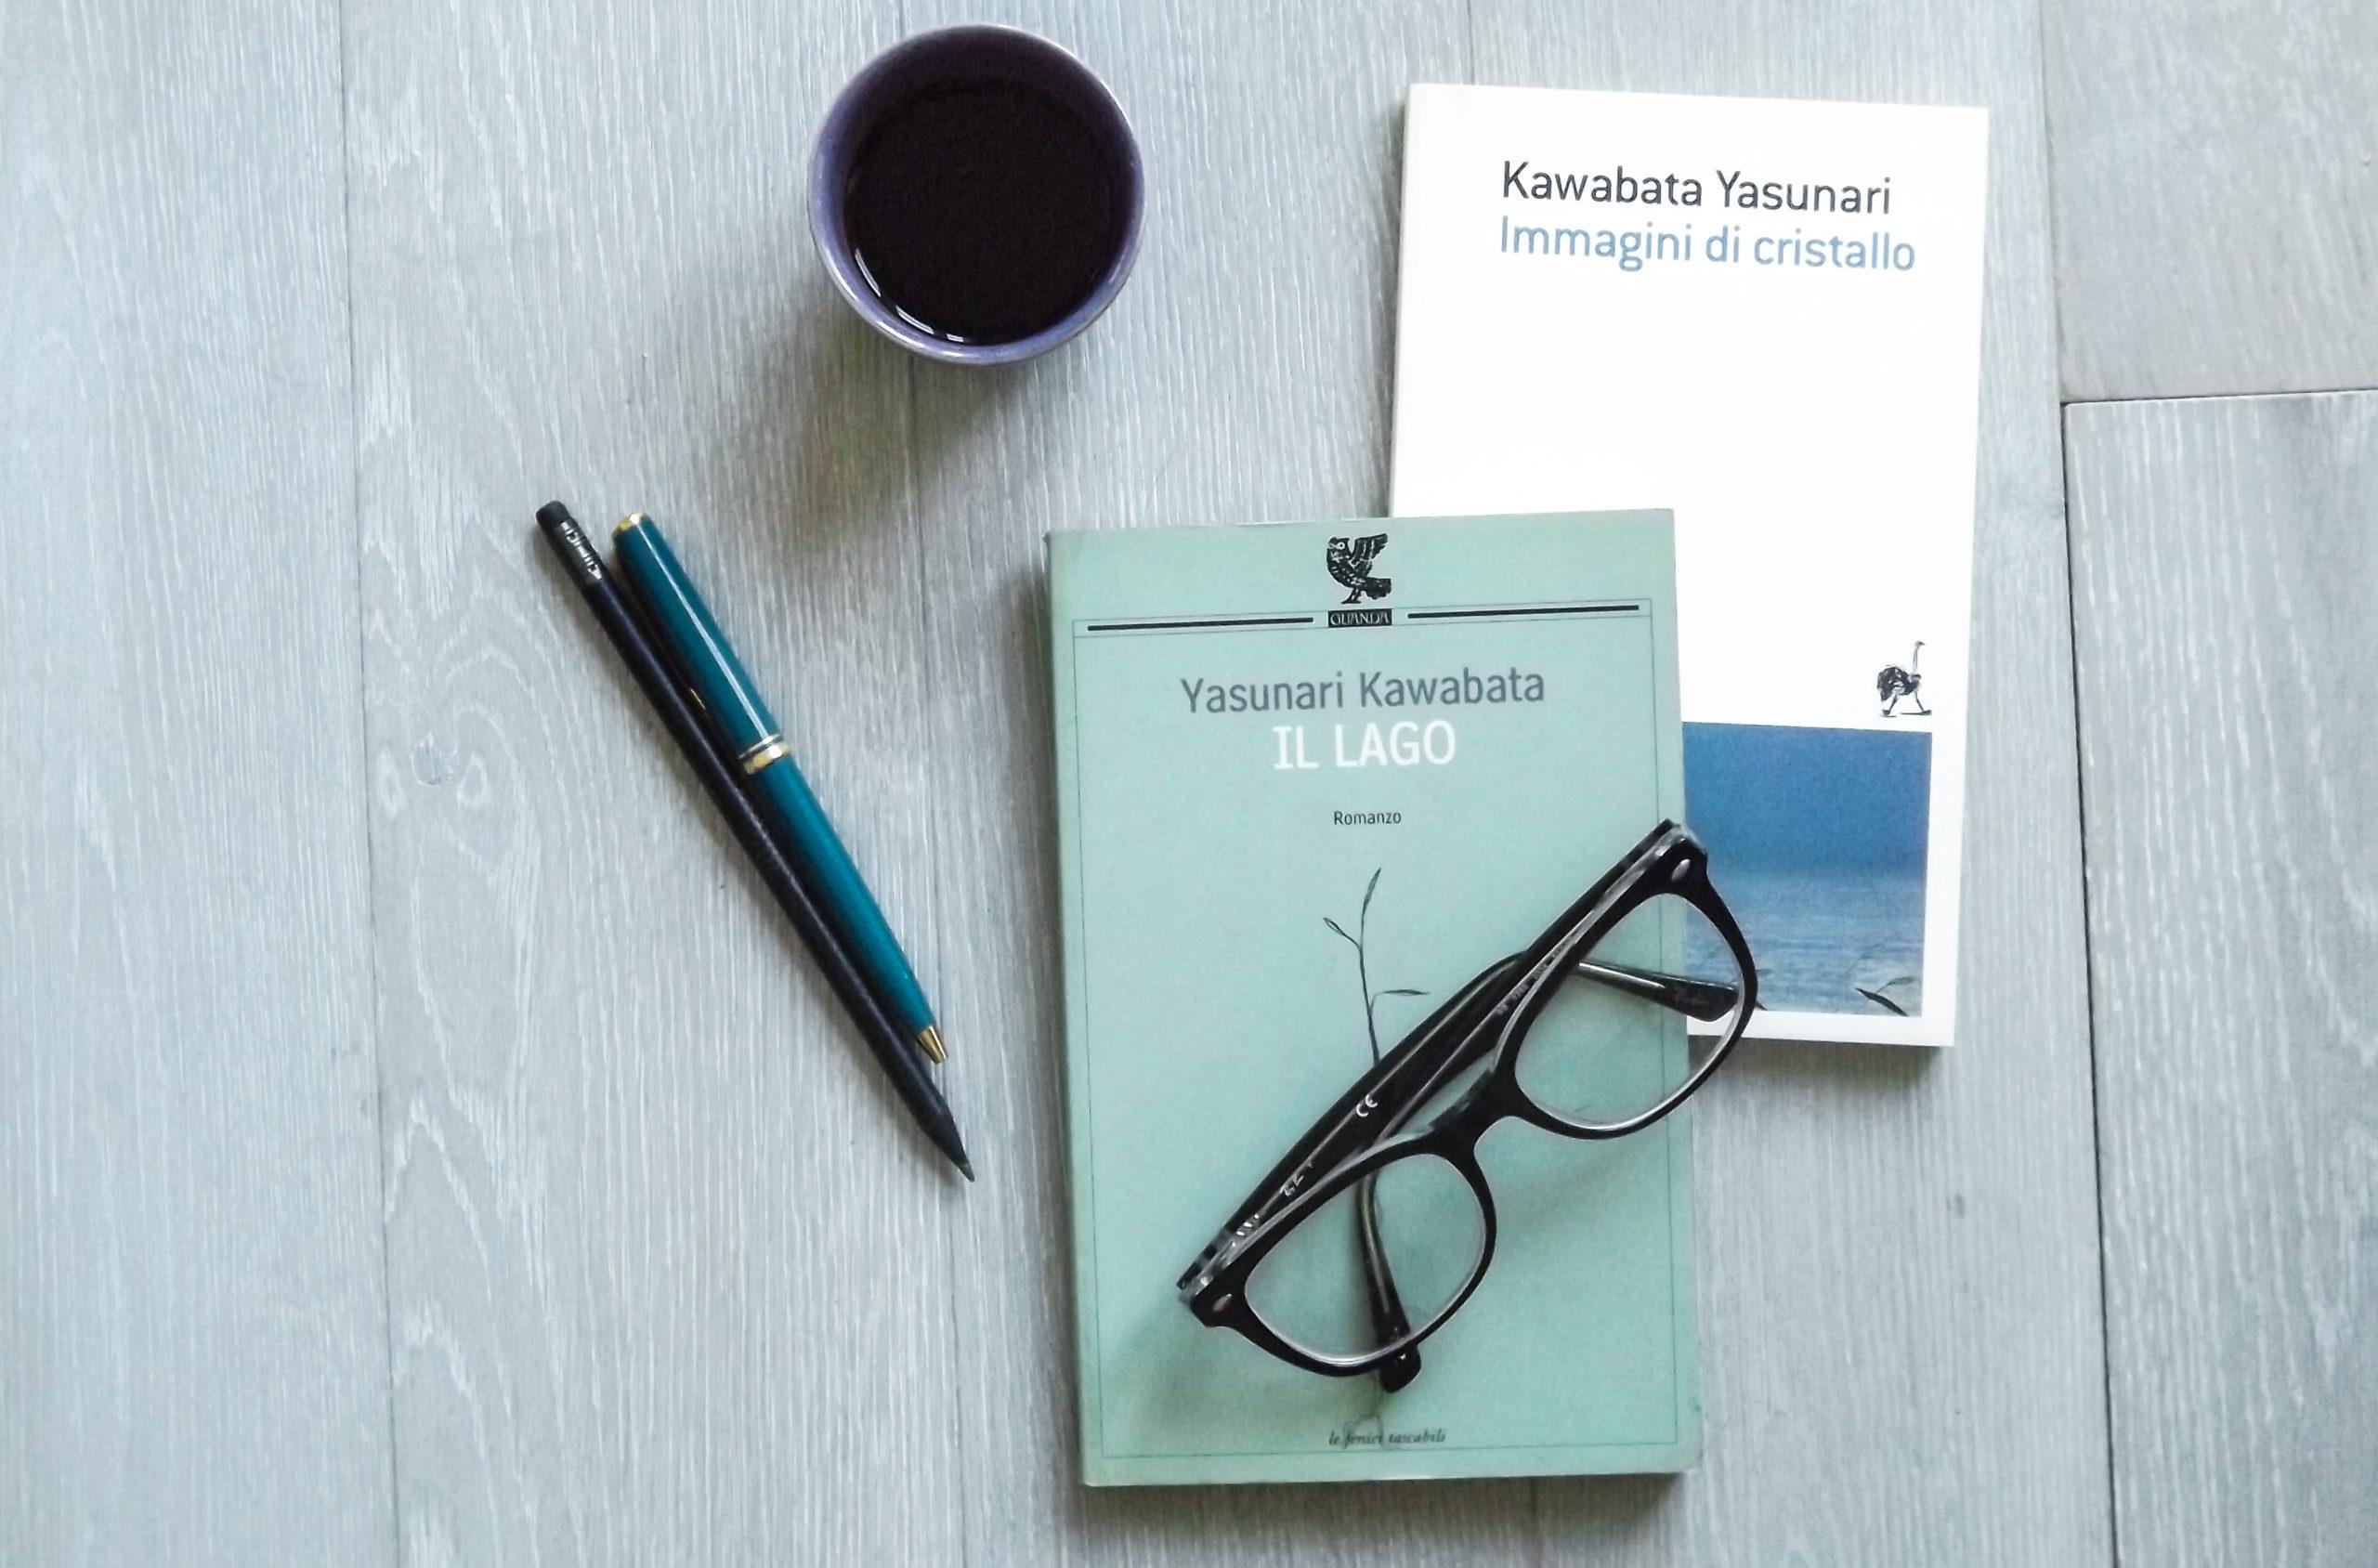 Japanese books and literature: Kawabata Yasunari